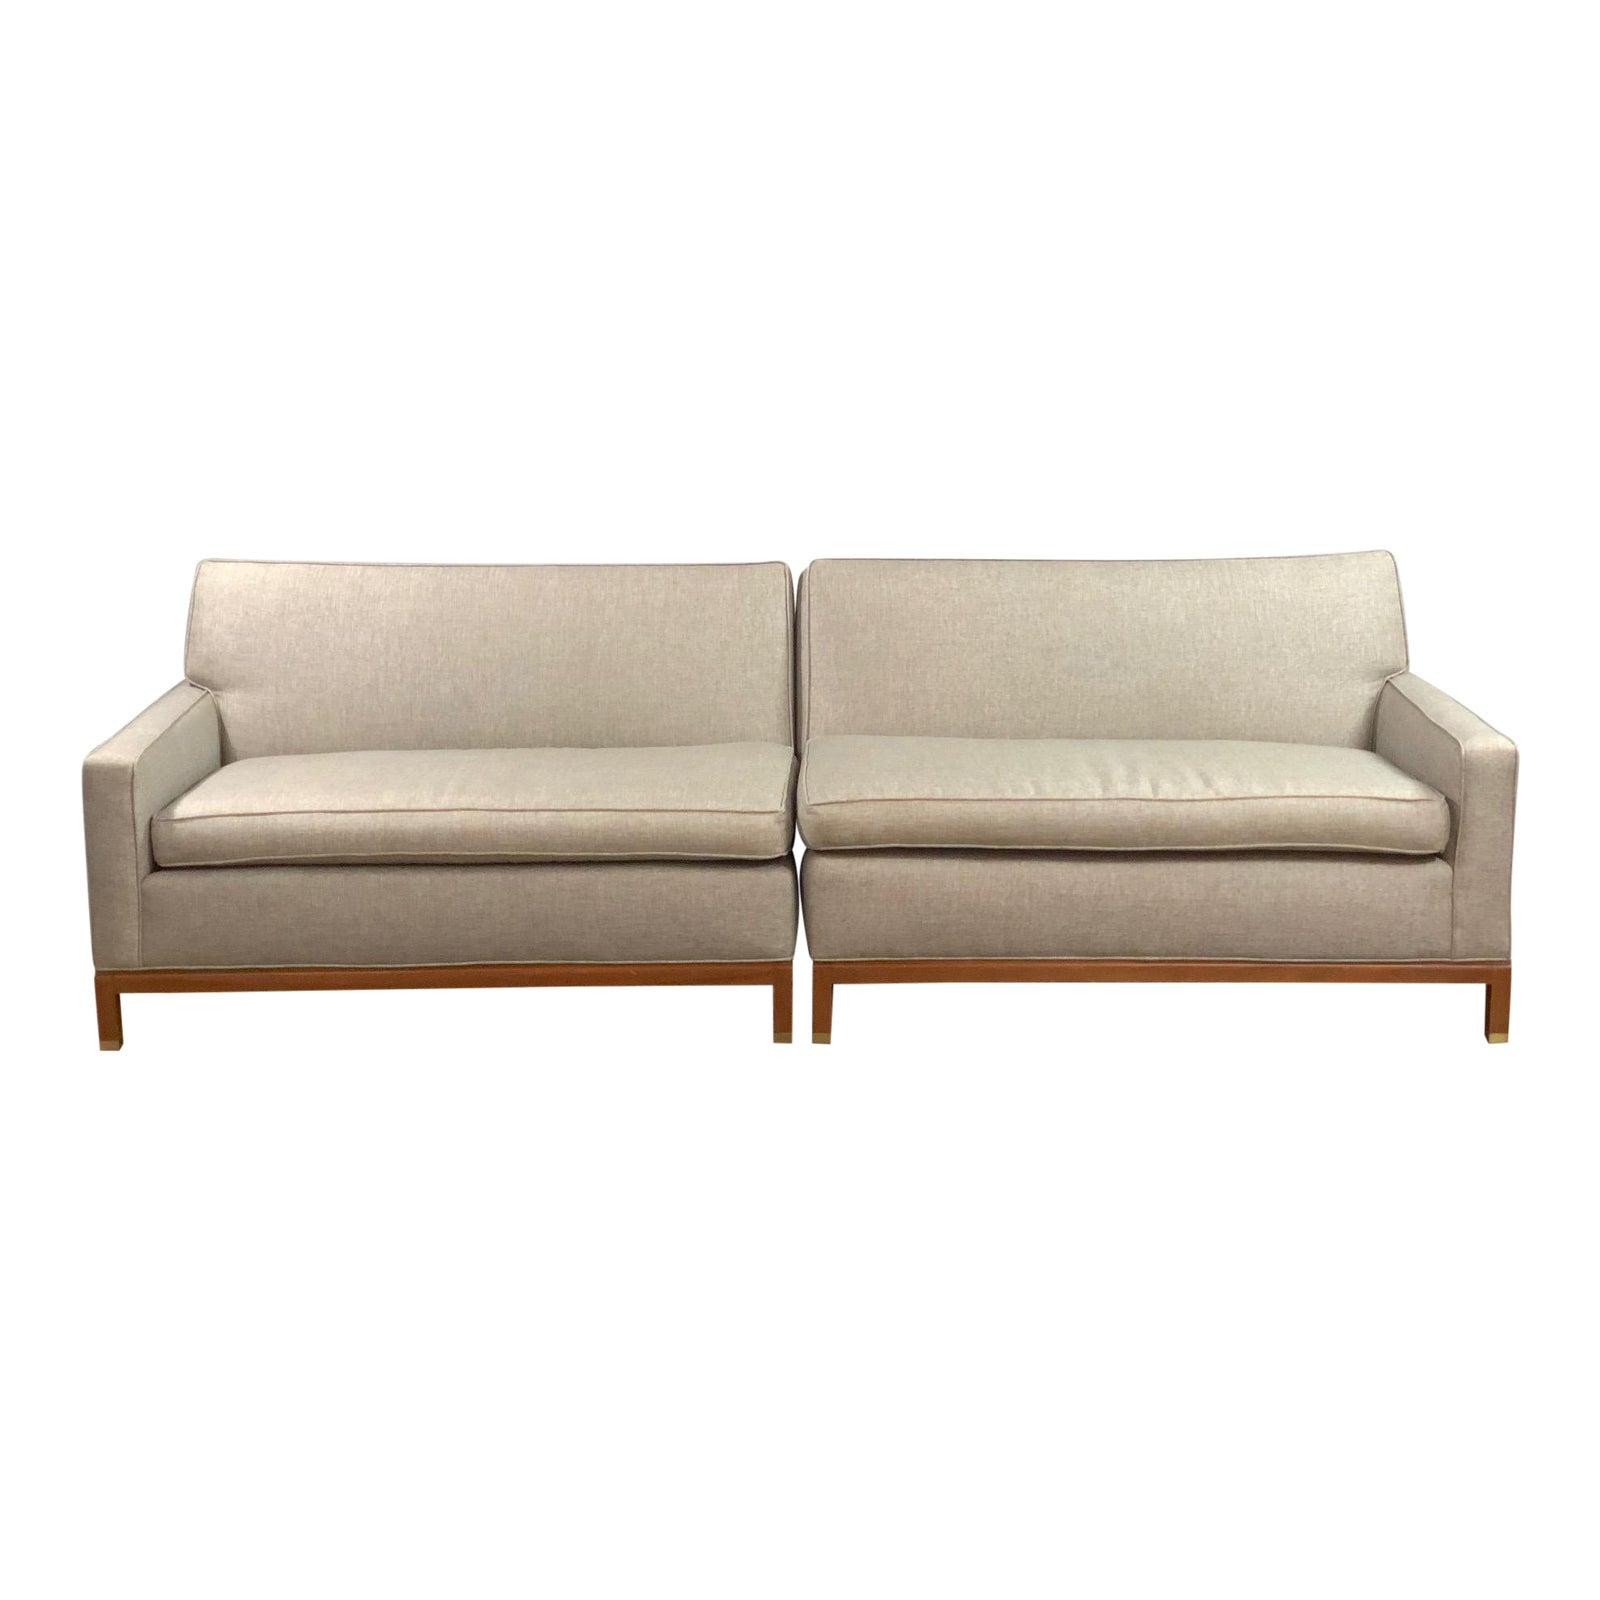 Mid Century Modern Milo Baughman Style Sectional Sofa- 2 Pieces ...